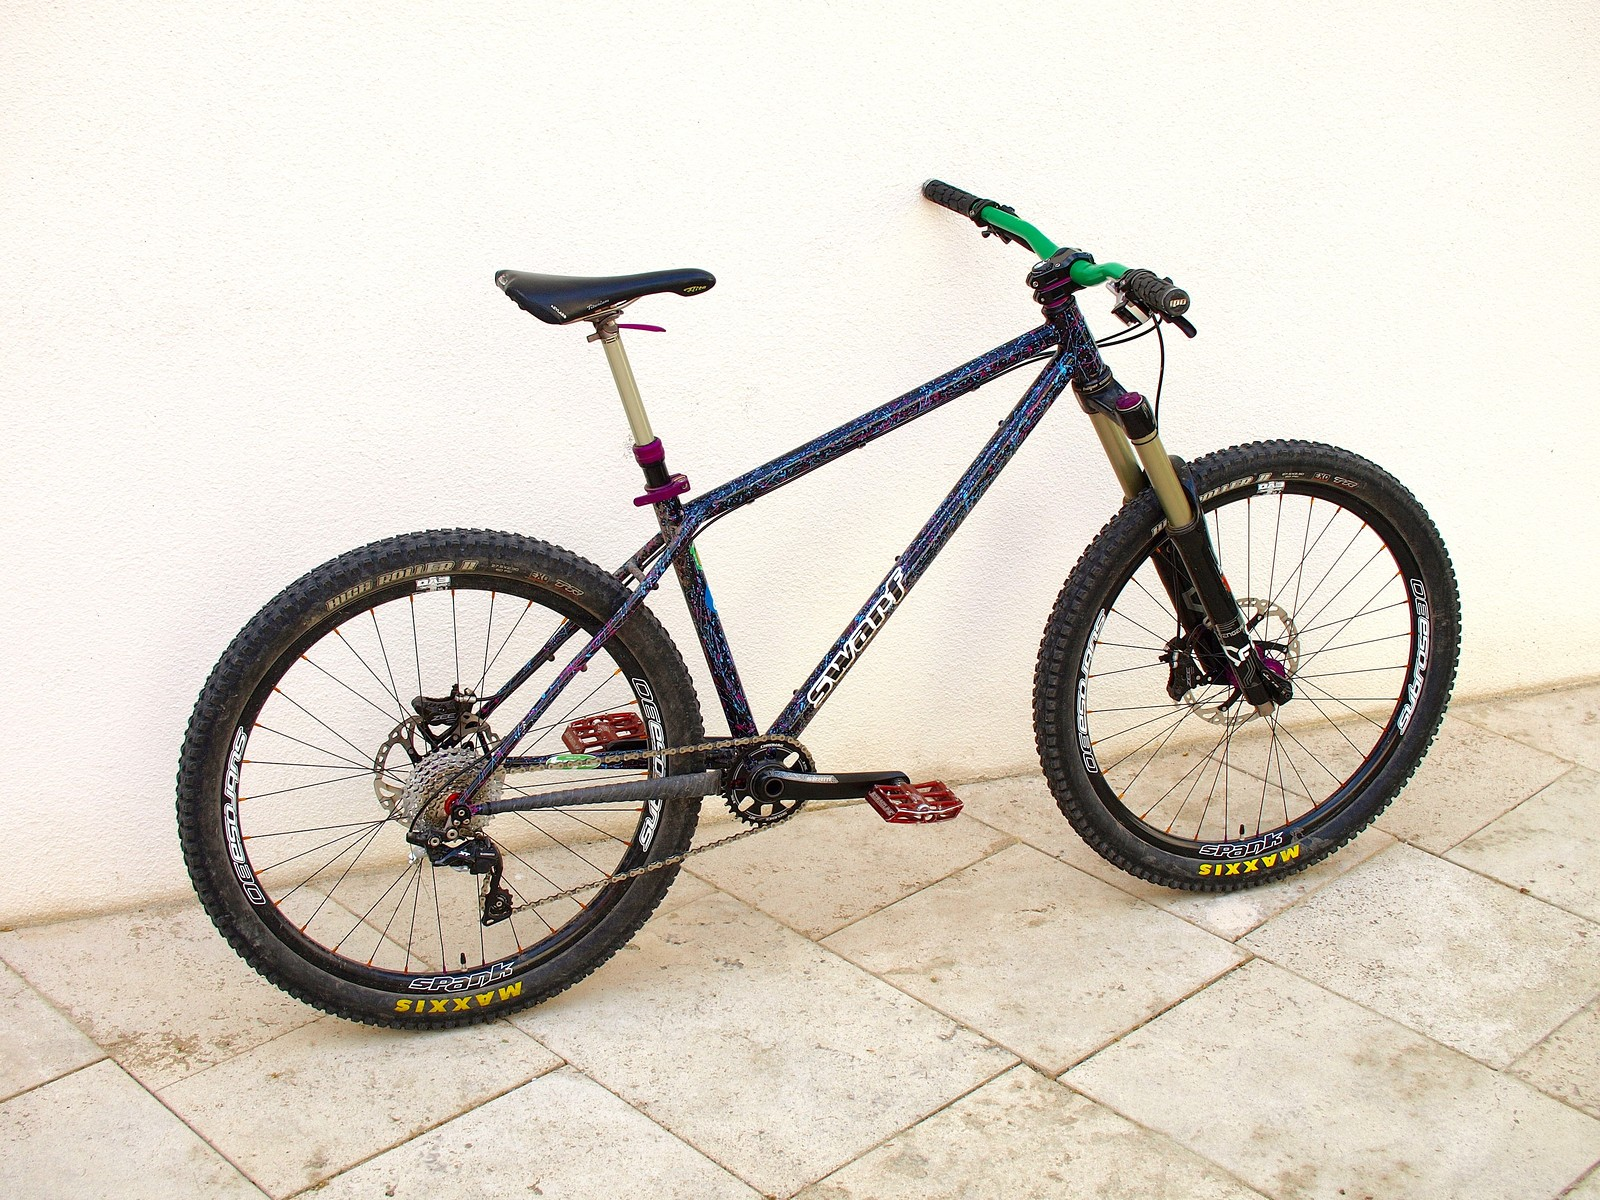 Swarf Cycles custom hardtail